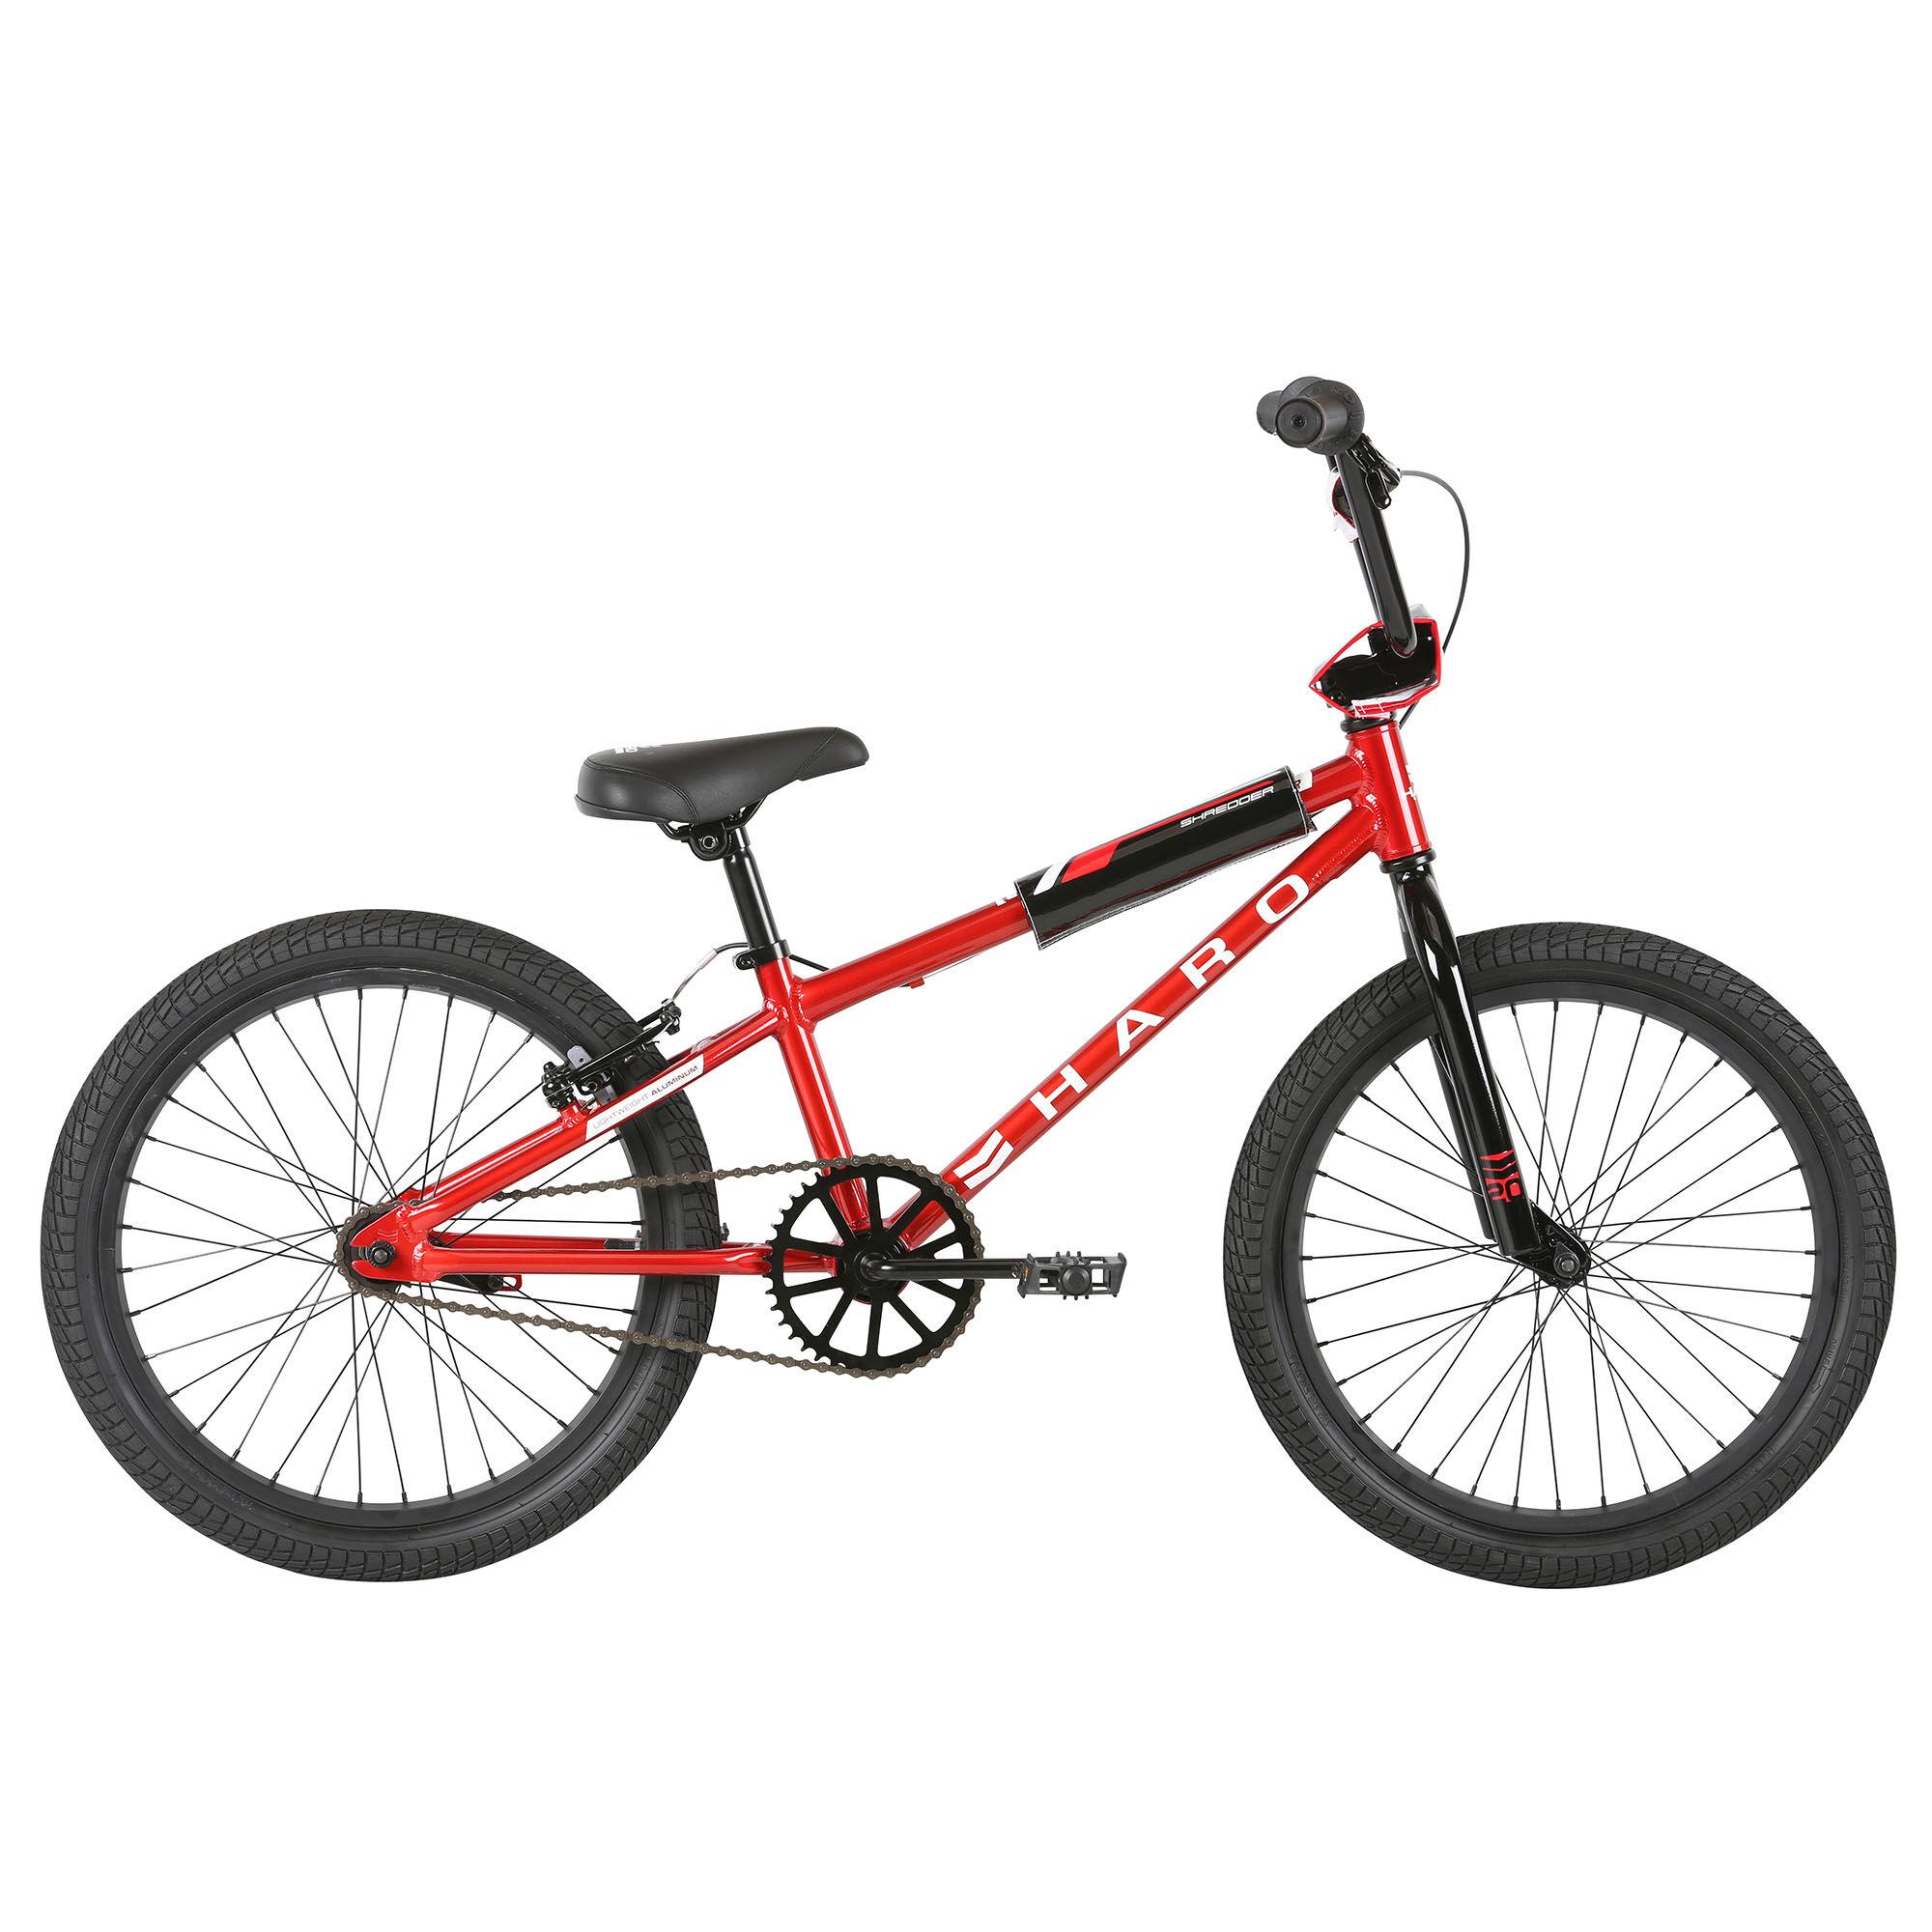 Haro Boy's Shredder 20 Sidewalk Bike '21  - Matte Black - Size: 20